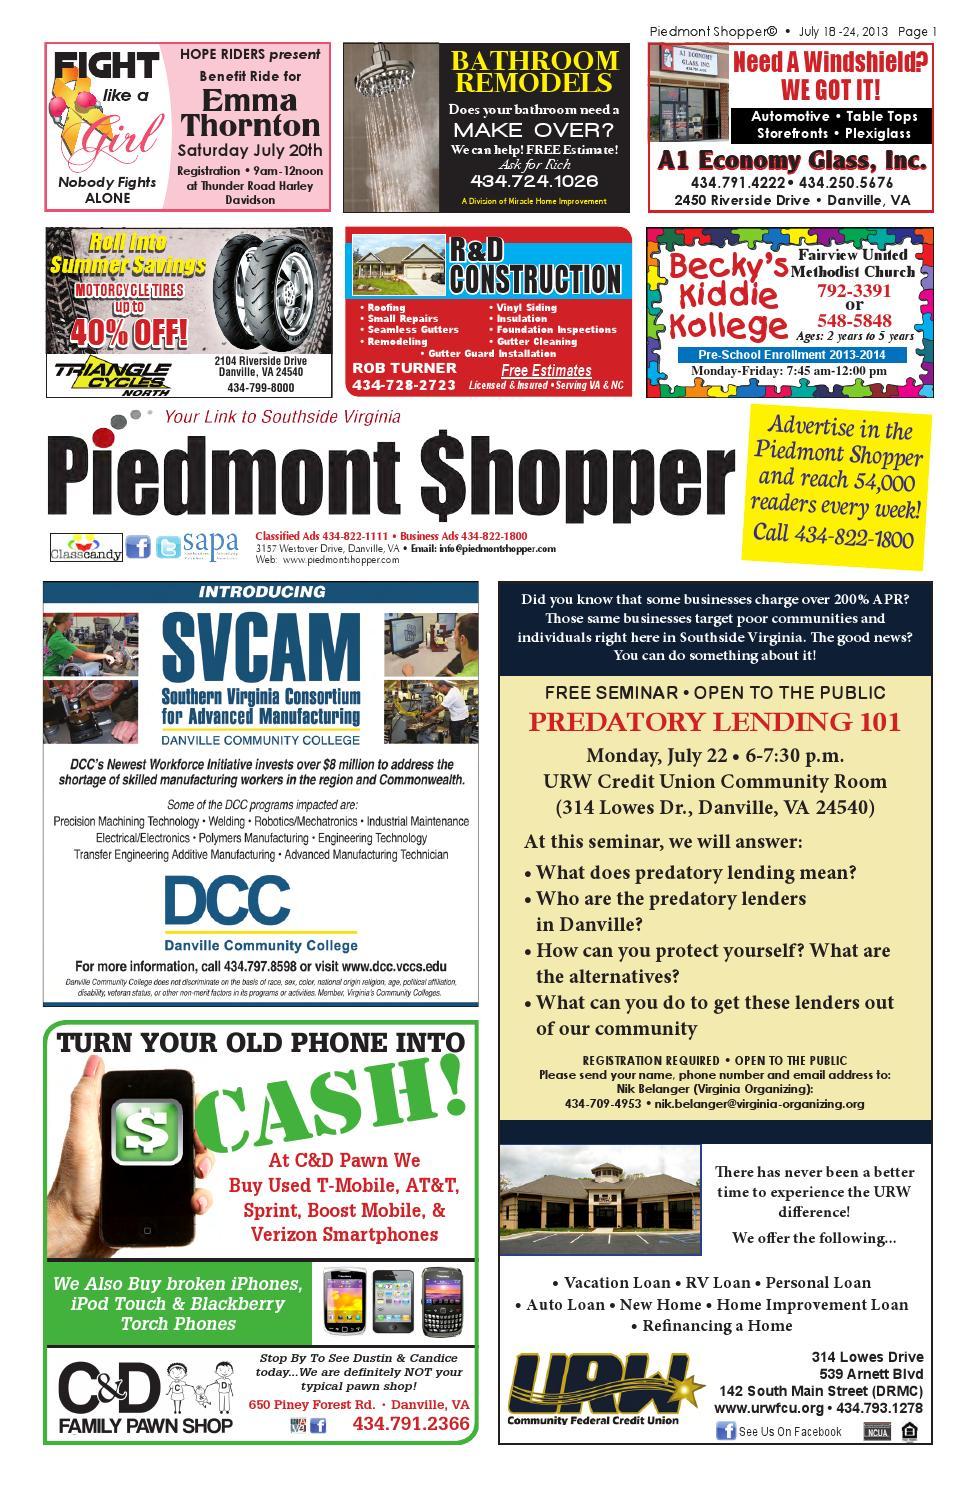 Piedmont Shopper 7 18 13 by piedmont shopper - issuu